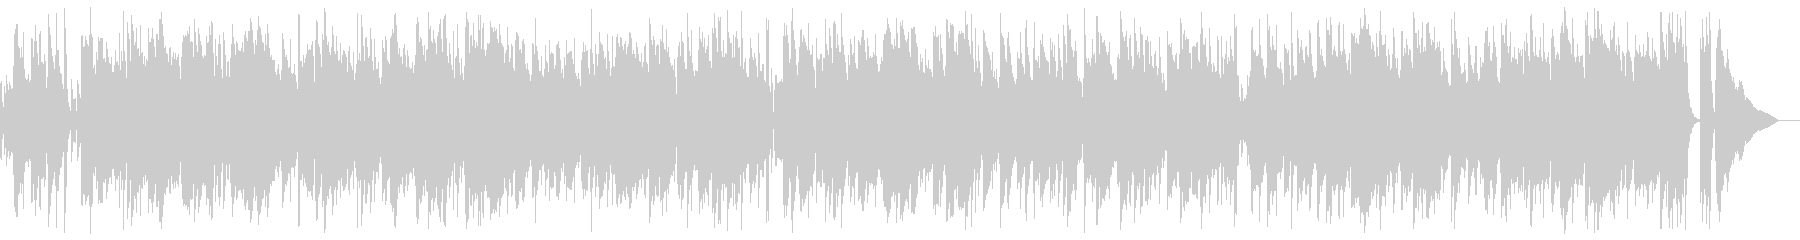 Hilo One(ハワイアン)の未再生の波形